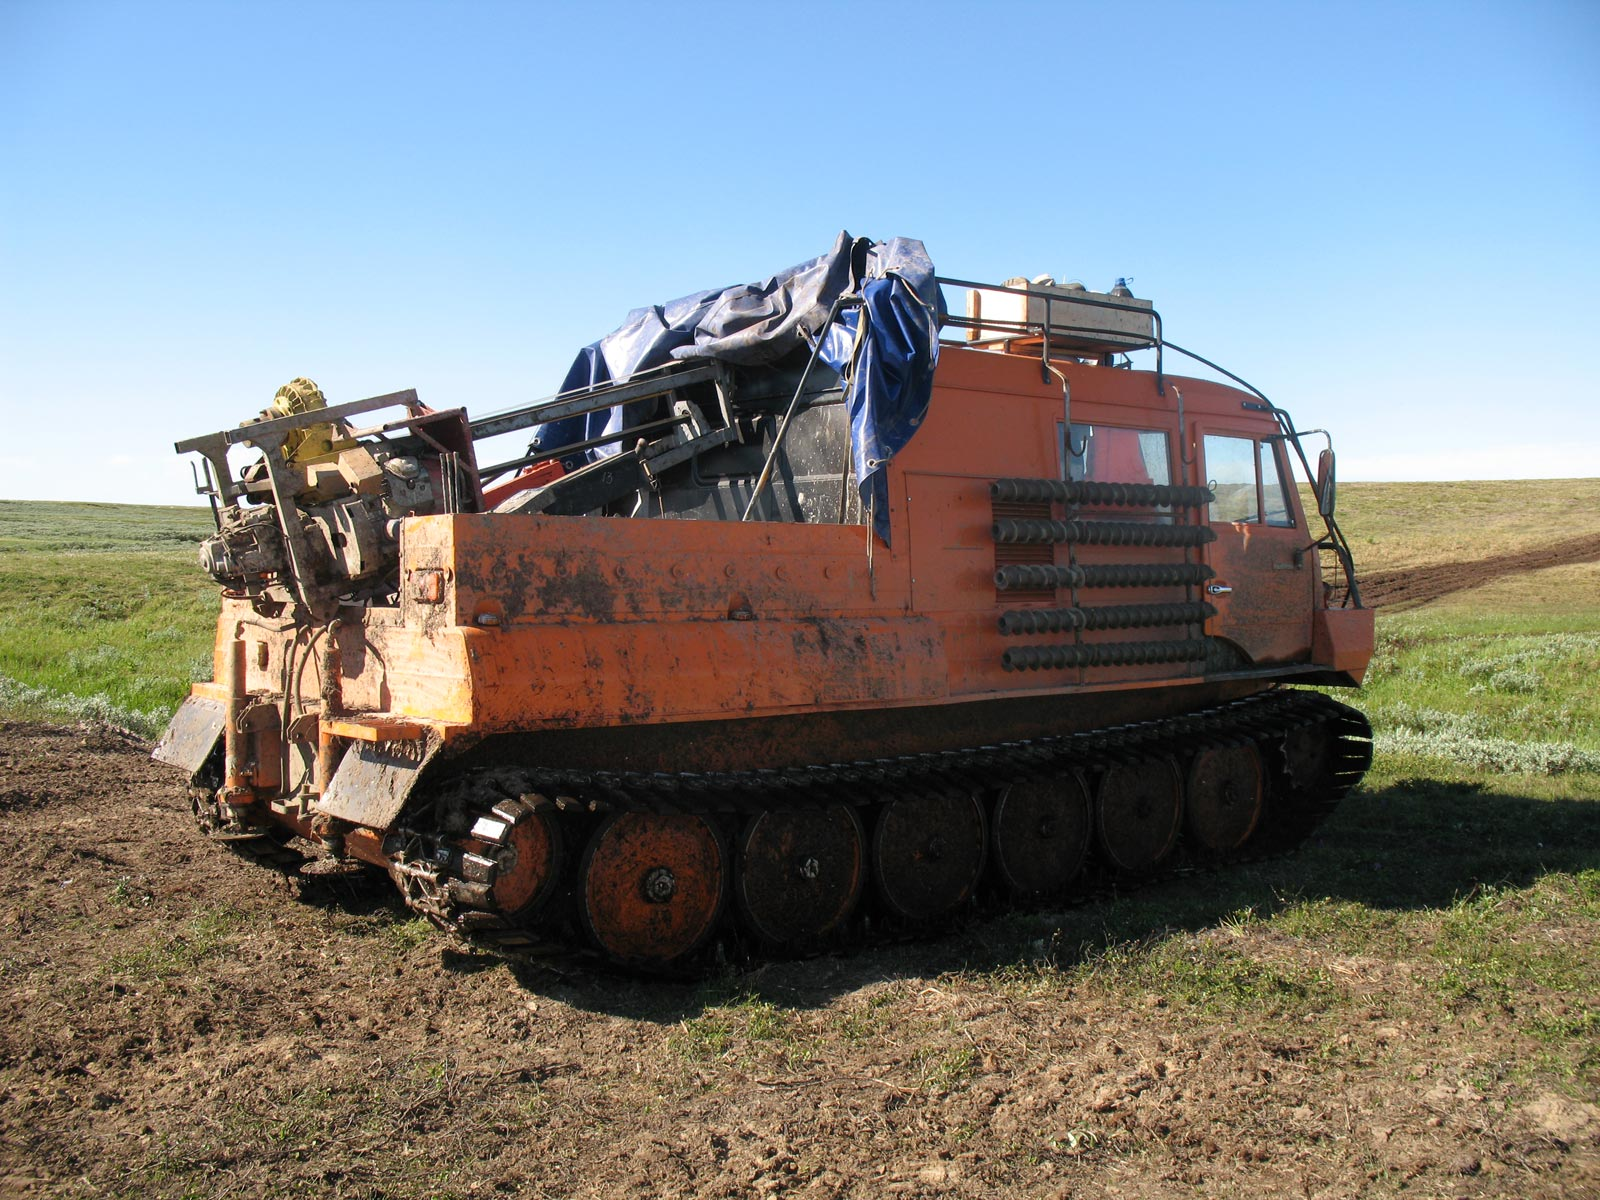 Установка буровая шнековая малогабаритная УБШМ-1-20 на базе ТТМ-3902